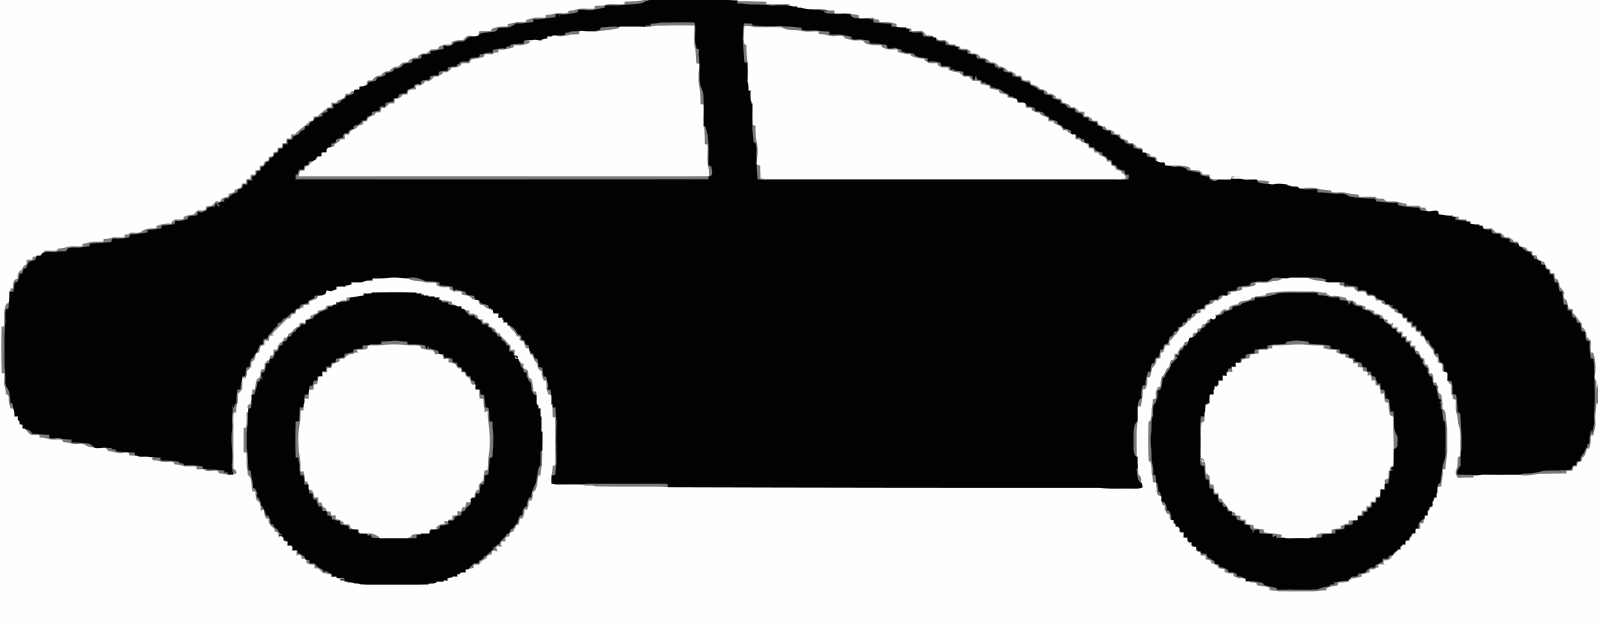 1598x626 Car Cartoon Images Clipart Clipartcow 2